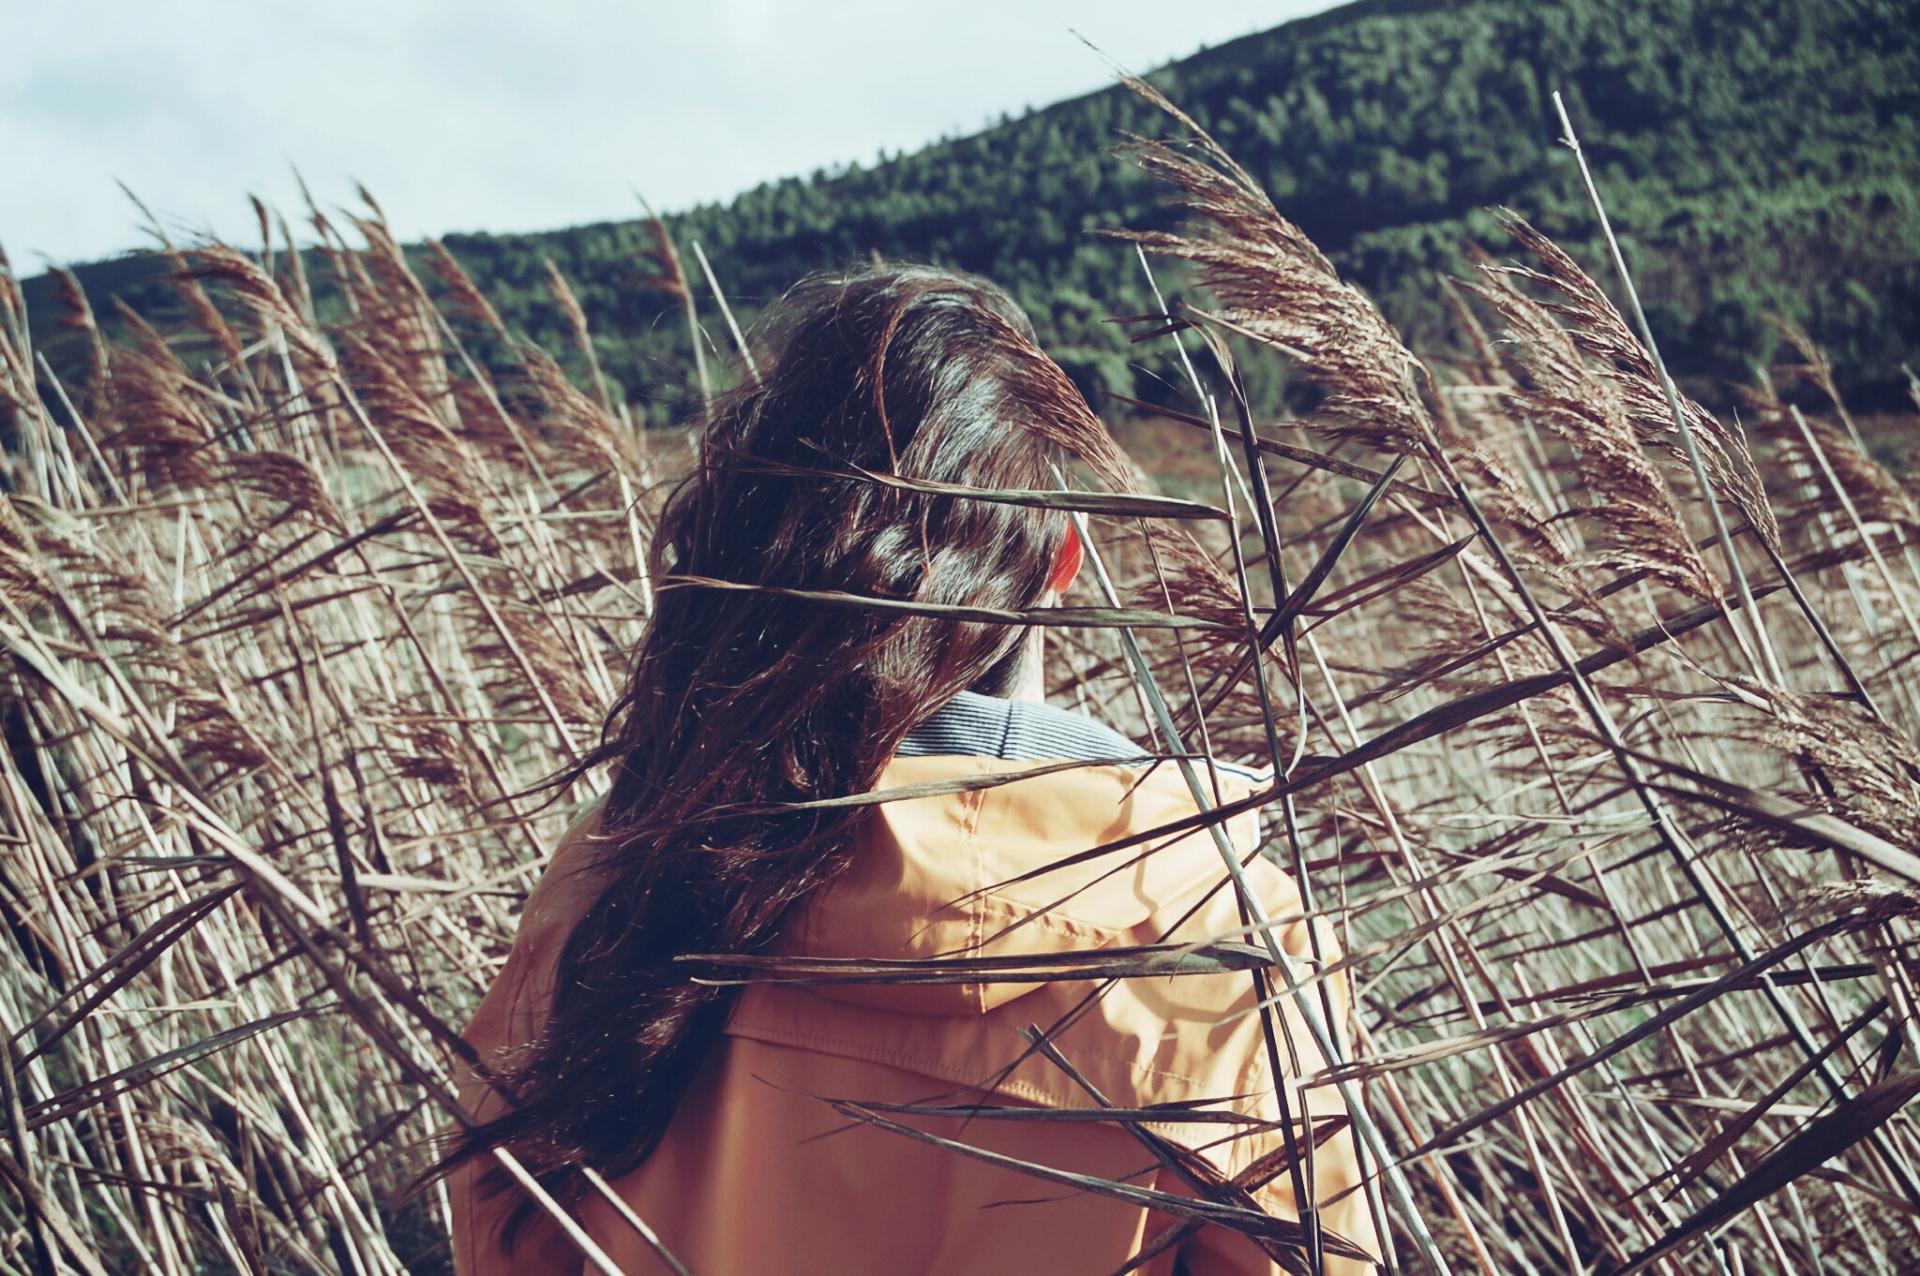 Life of pix free stock photos foat woman back santalla